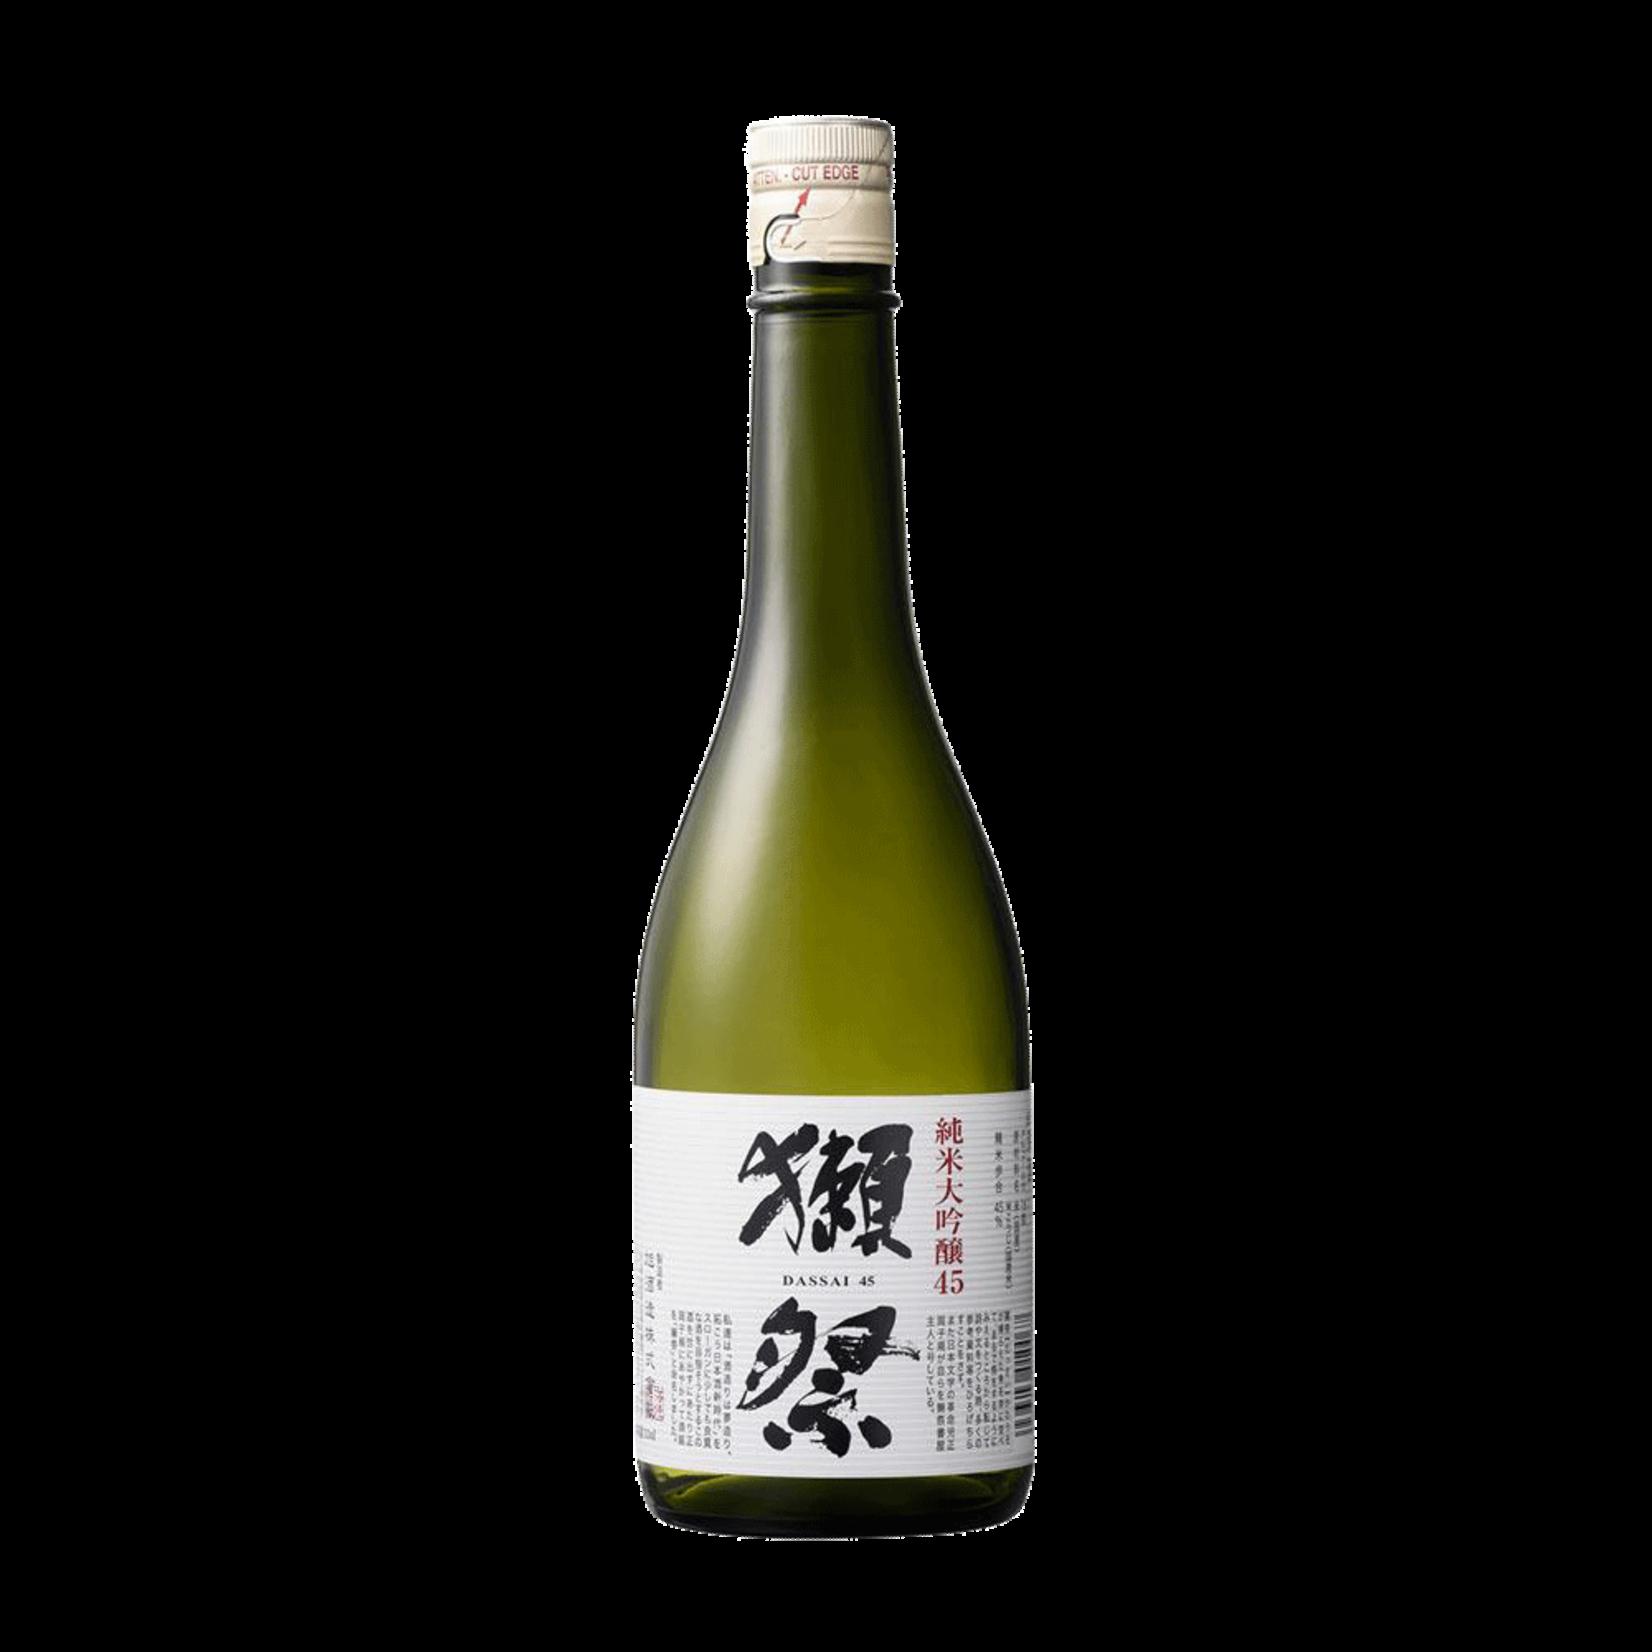 Sake Dassai 45 Junmai Daiginjo Sake 720ml